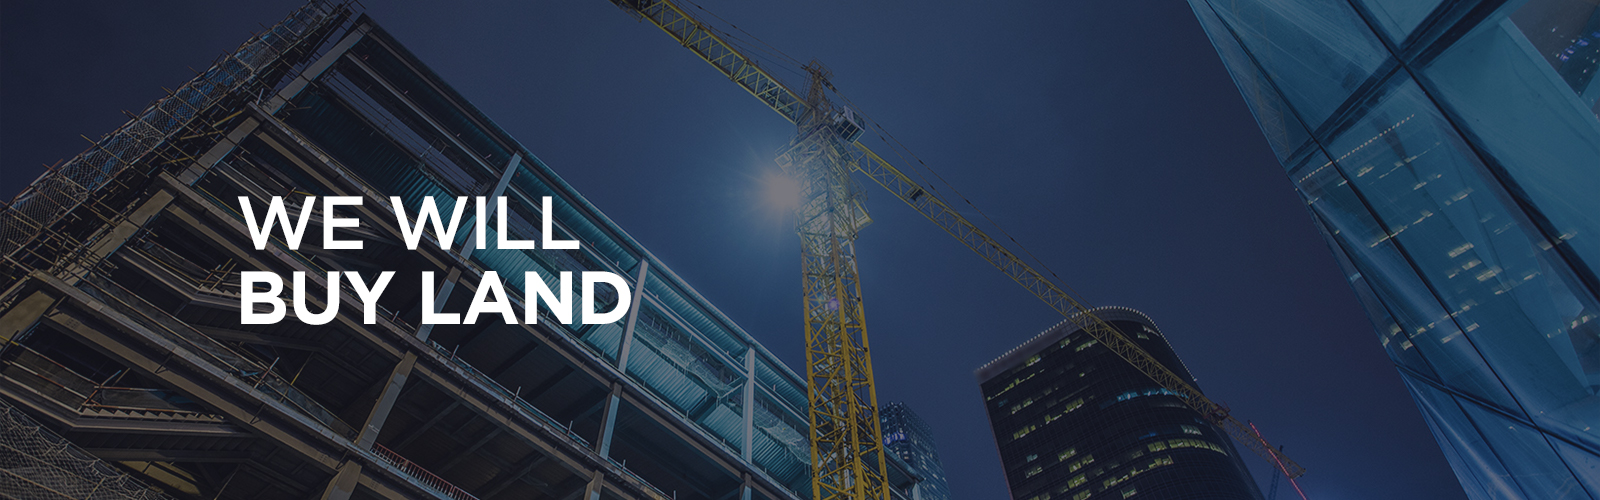 We will buy land - Marvipol DEV